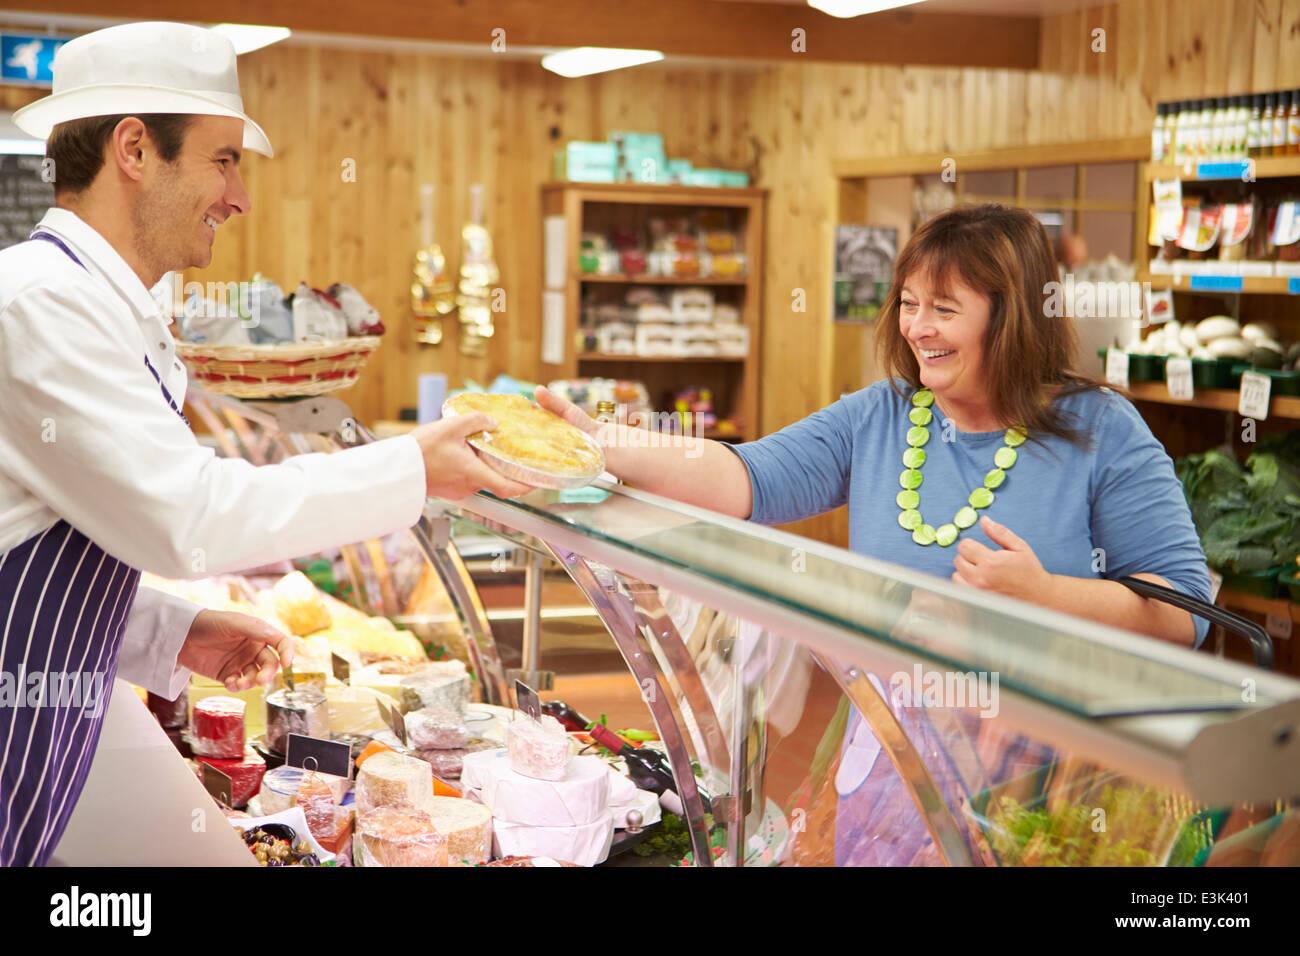 Male Sales Assistant Serving Customer In Delicatessen Stock Photo